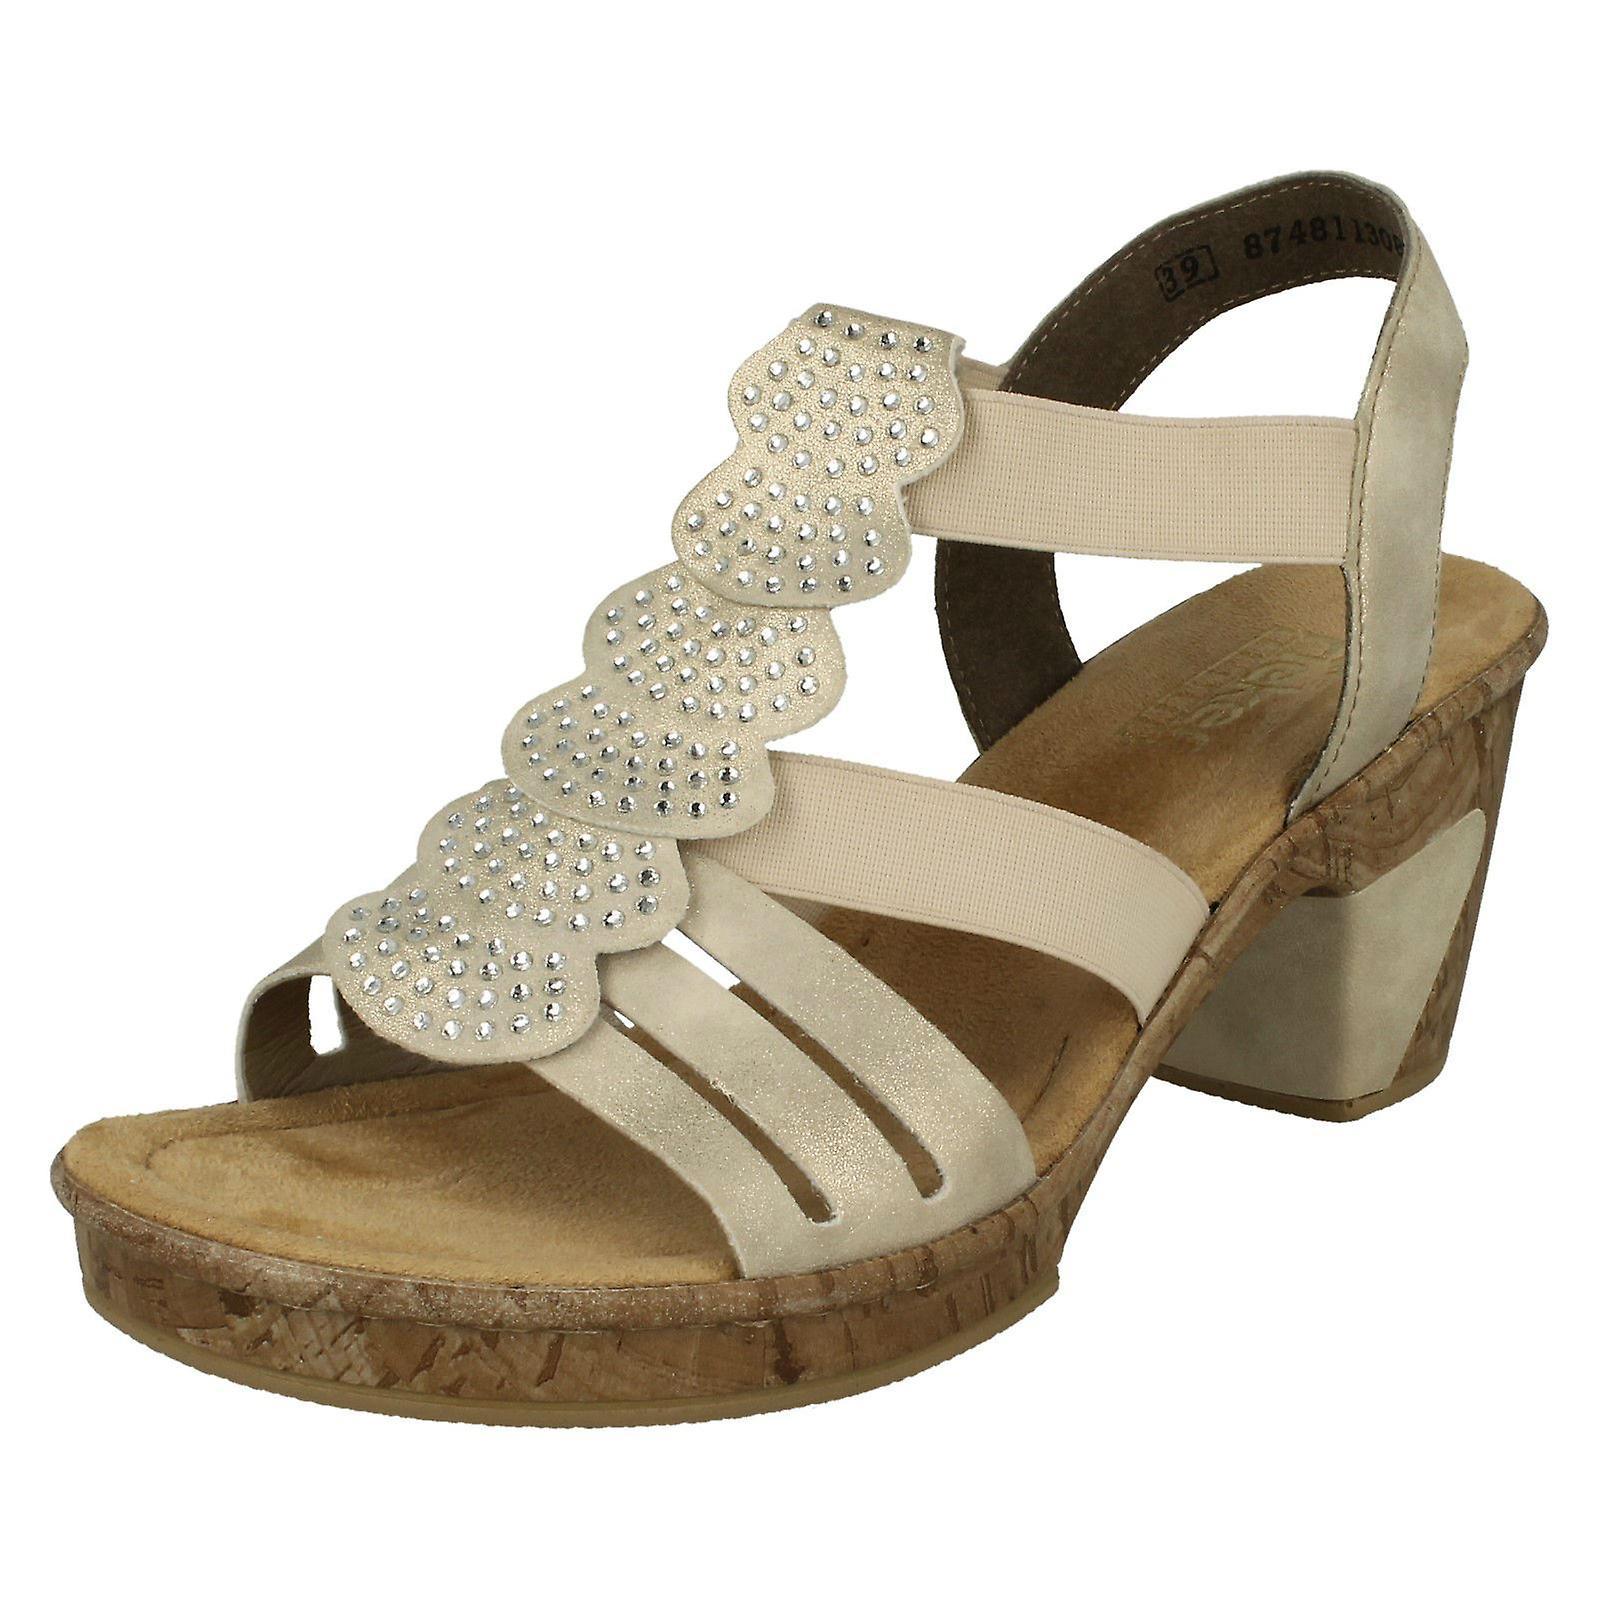 6d39b65a58f84 Ladies Rieker Slingback Heeled Sandals 69702-60 - Beige Synthetic - UK Size  3.5 -